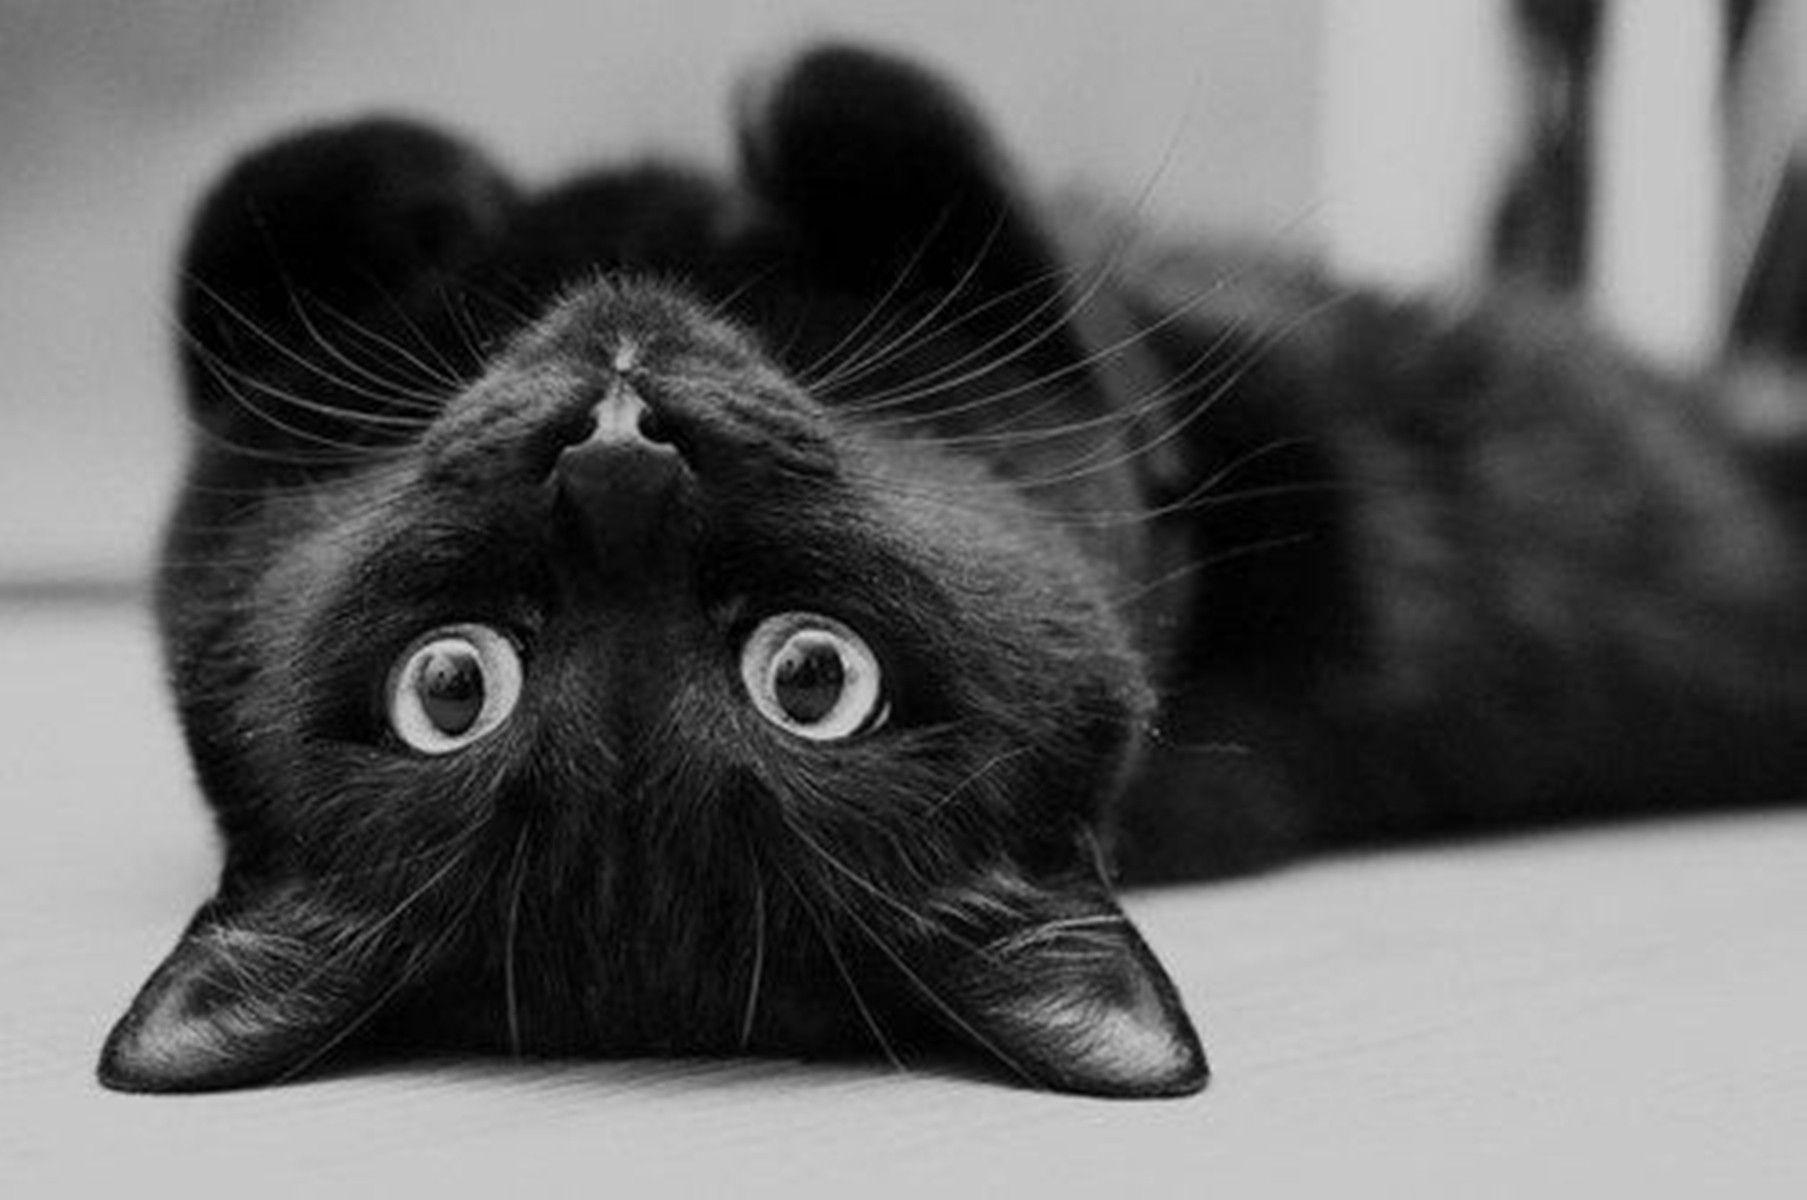 Pin by Chen Li on Gatos Cats, Cute animals, Pretty cats